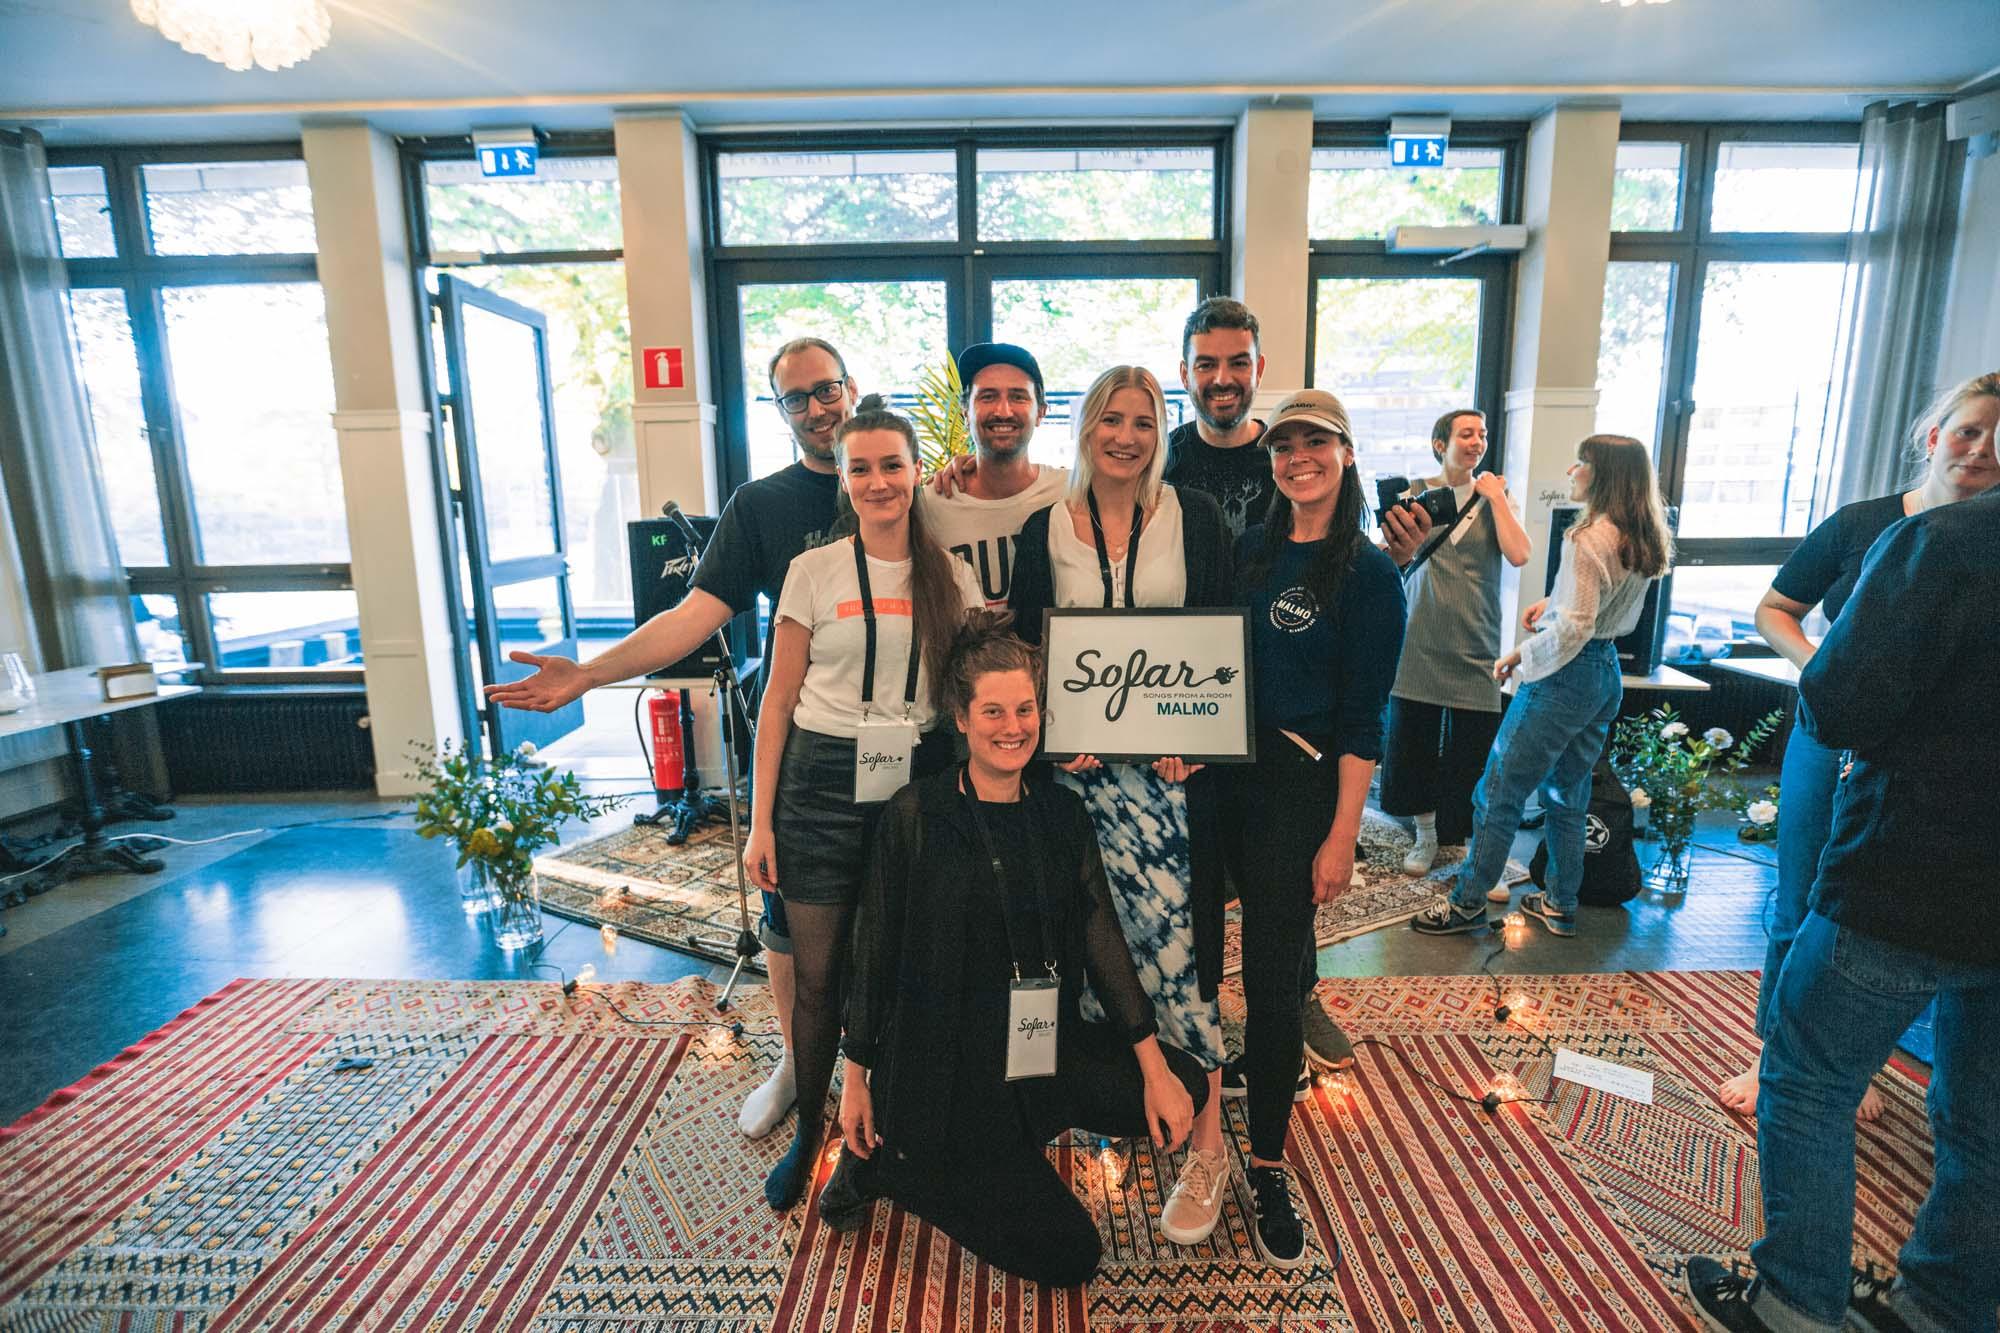 Sofar Sounds Malmö - Ongoing collaboration since August 2018